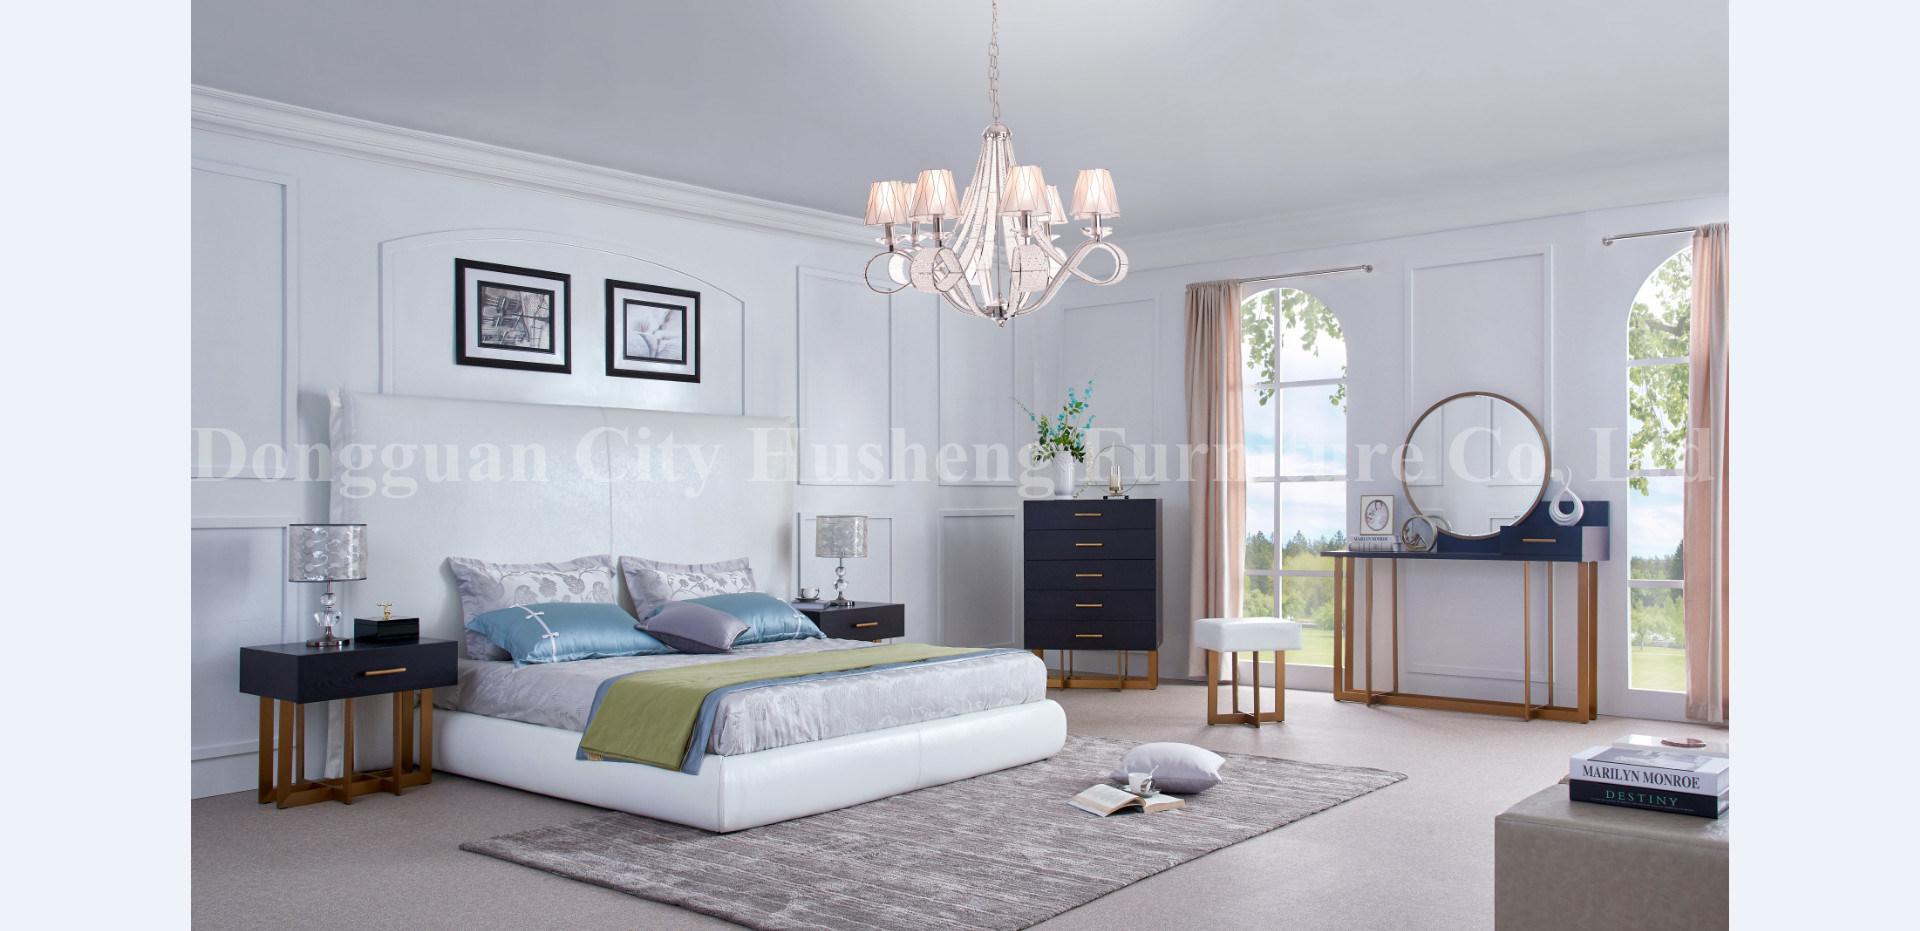 China Fashionable Design Luxury King Size Hotel Bedroom Furniture Sets For Sale China Hotel Bedroom Set Bedroom Set